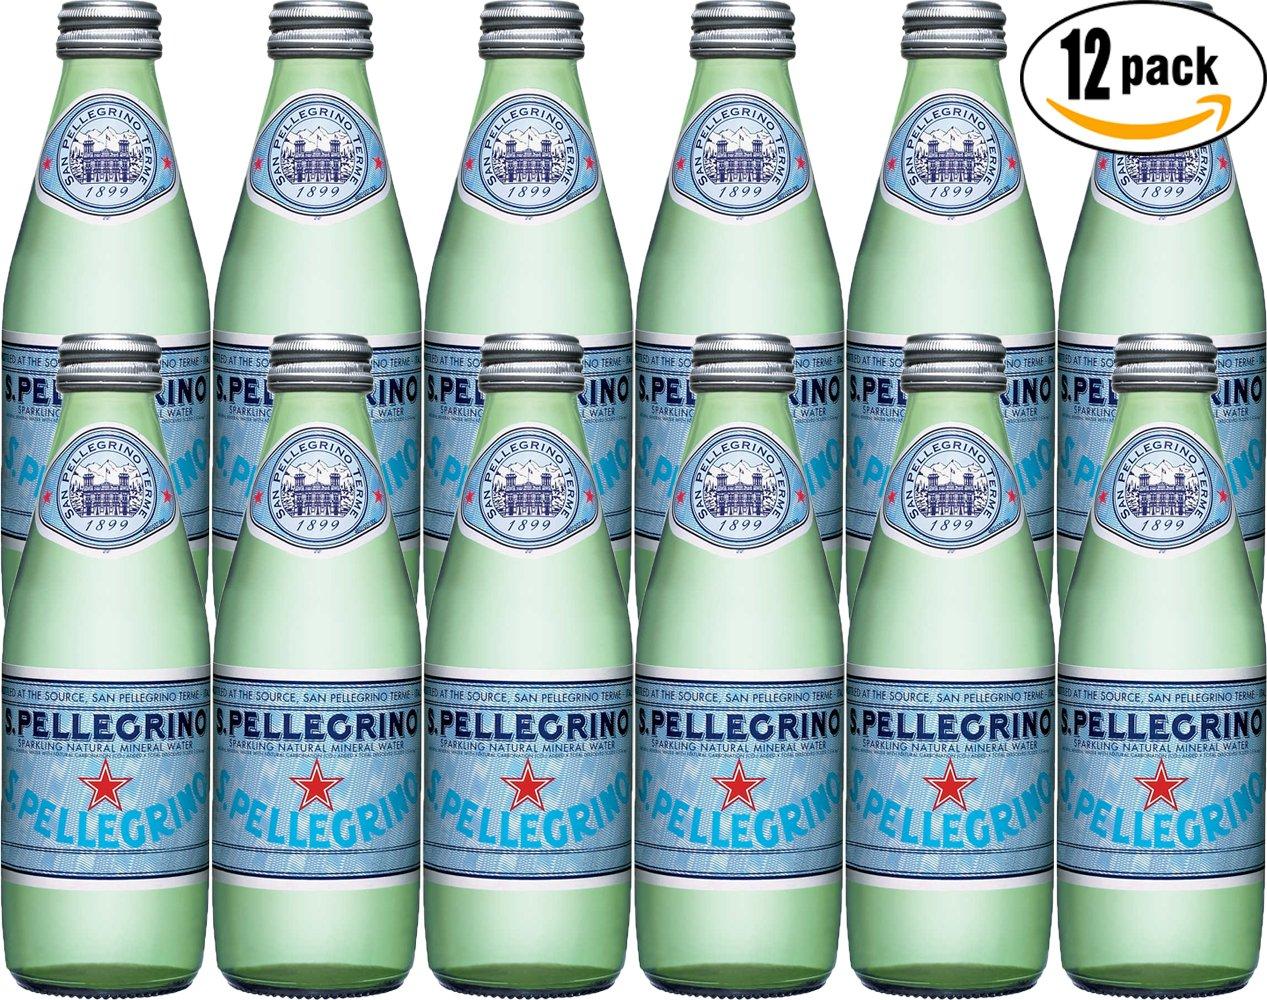 San Pellegrino Sparkling Natural Mineral Water, 8.45oz Glass Bottle (Pack of 12)